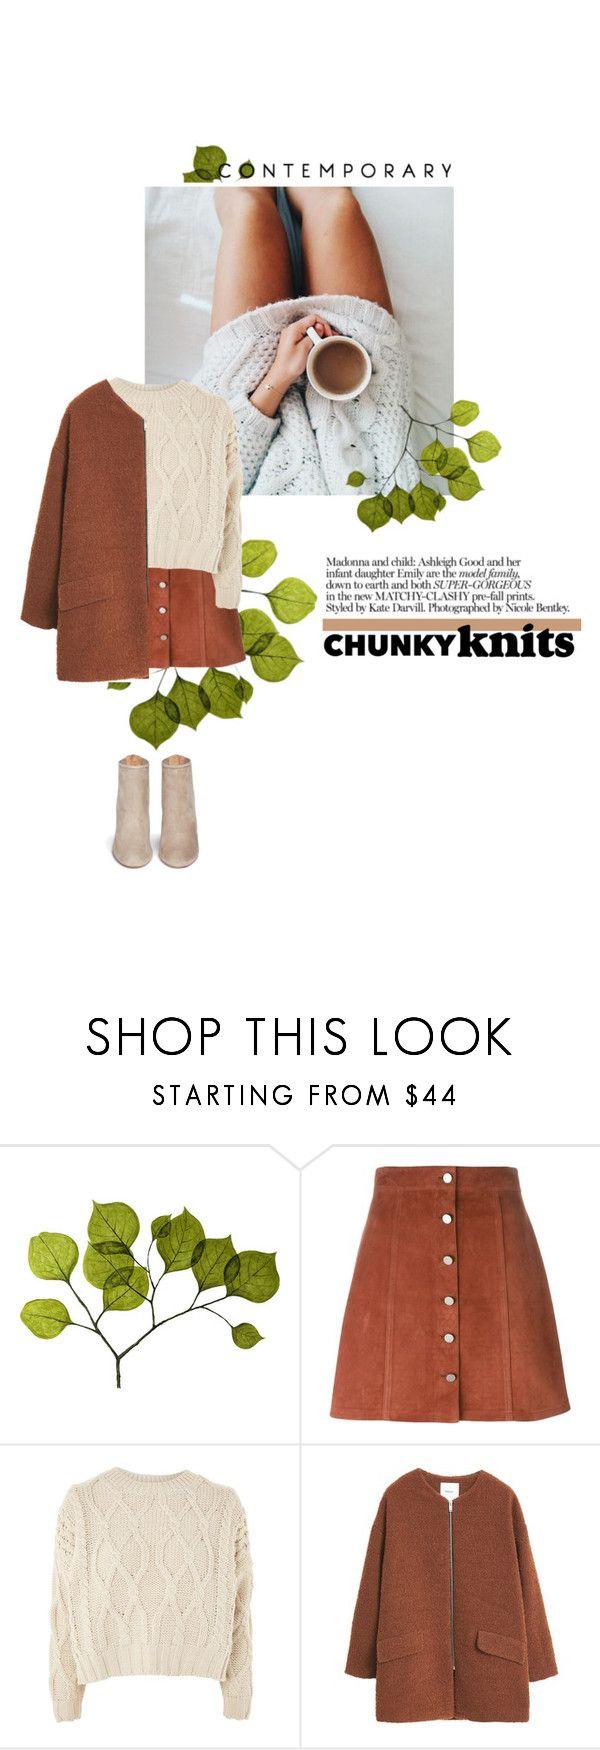 """chunky knits"" by fernweeh on Polyvore featuring moda, Dot & Bo, Theory, Topshop, MANGO i Aquazzura"